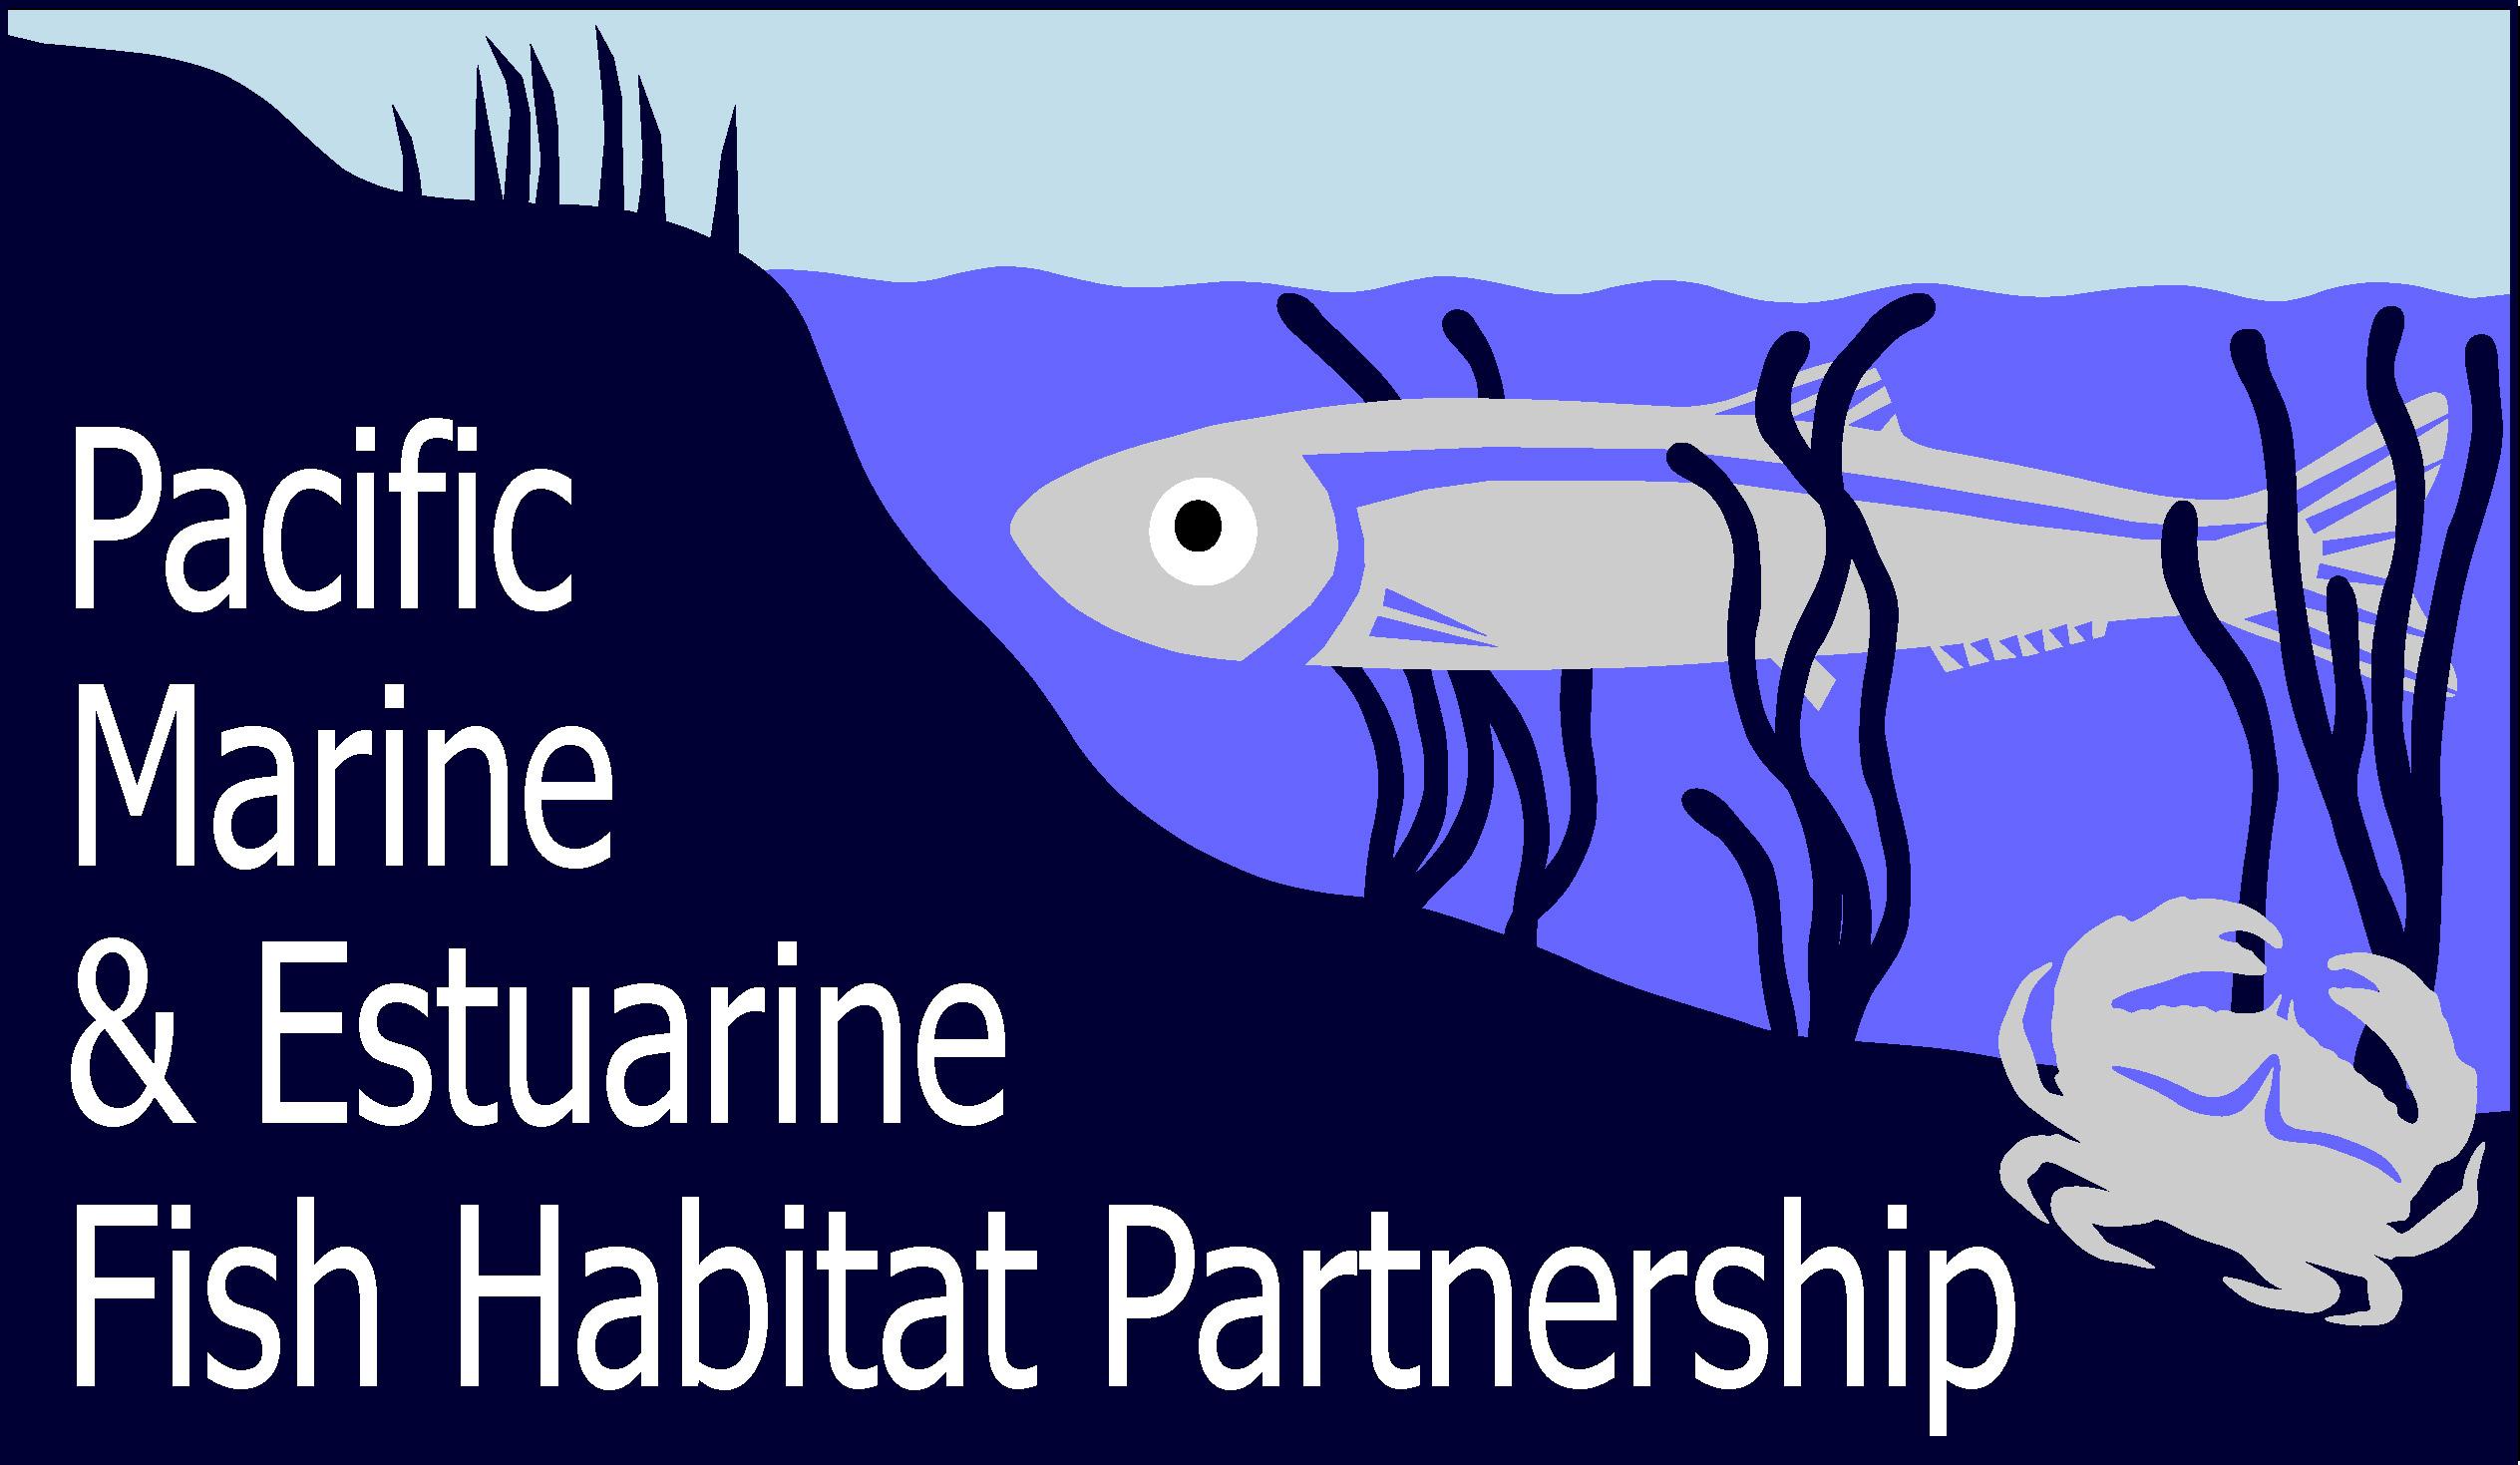 Pacific Marine and Estuarine Fish Habitat Partnership